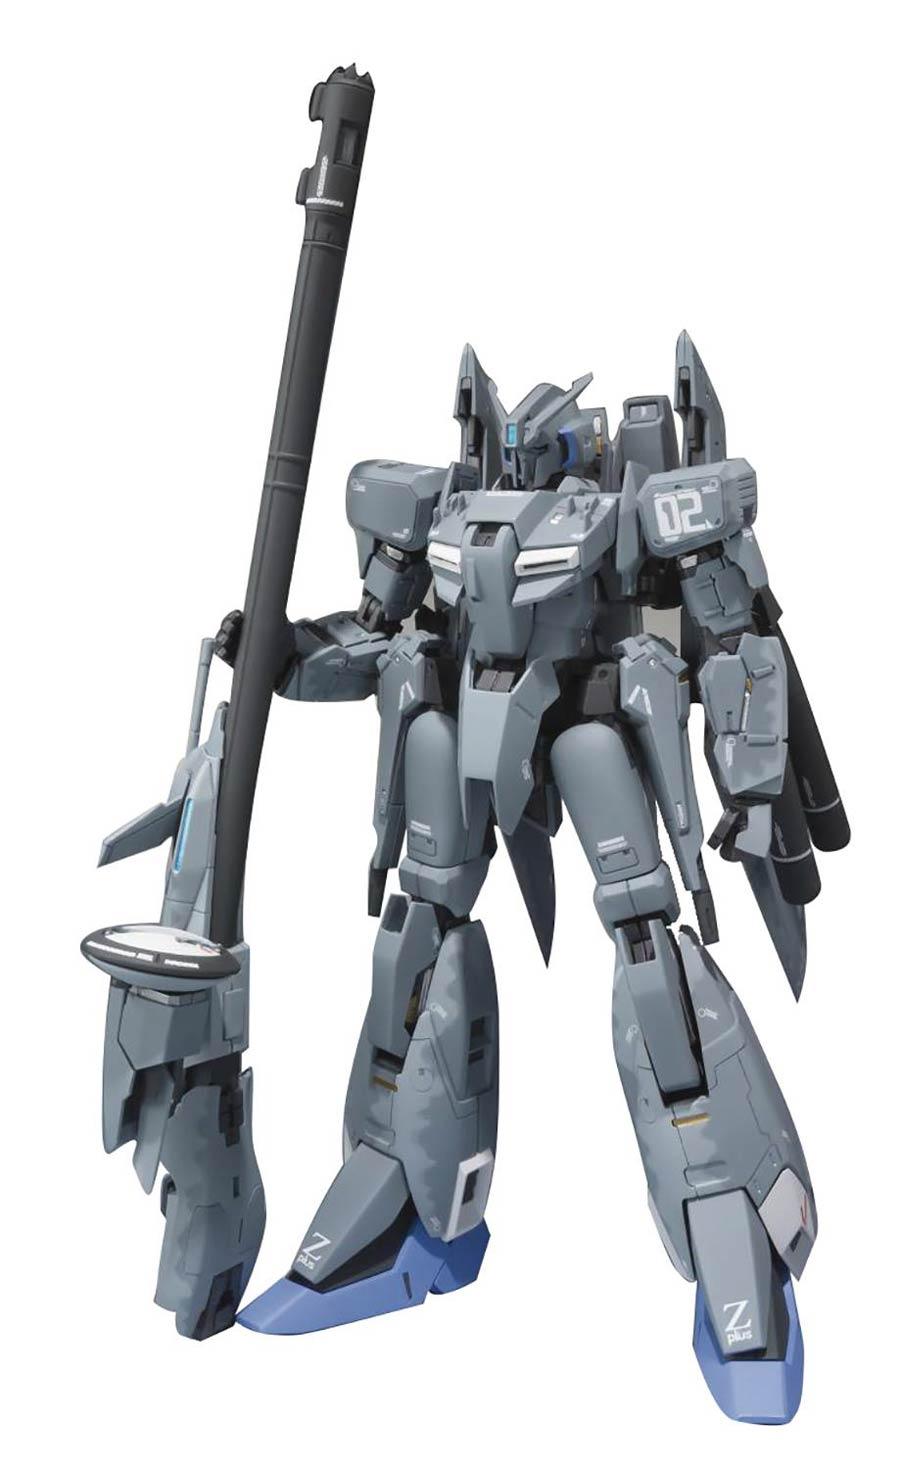 Metal Robot Spirits - Z Plus C1 Action Figure